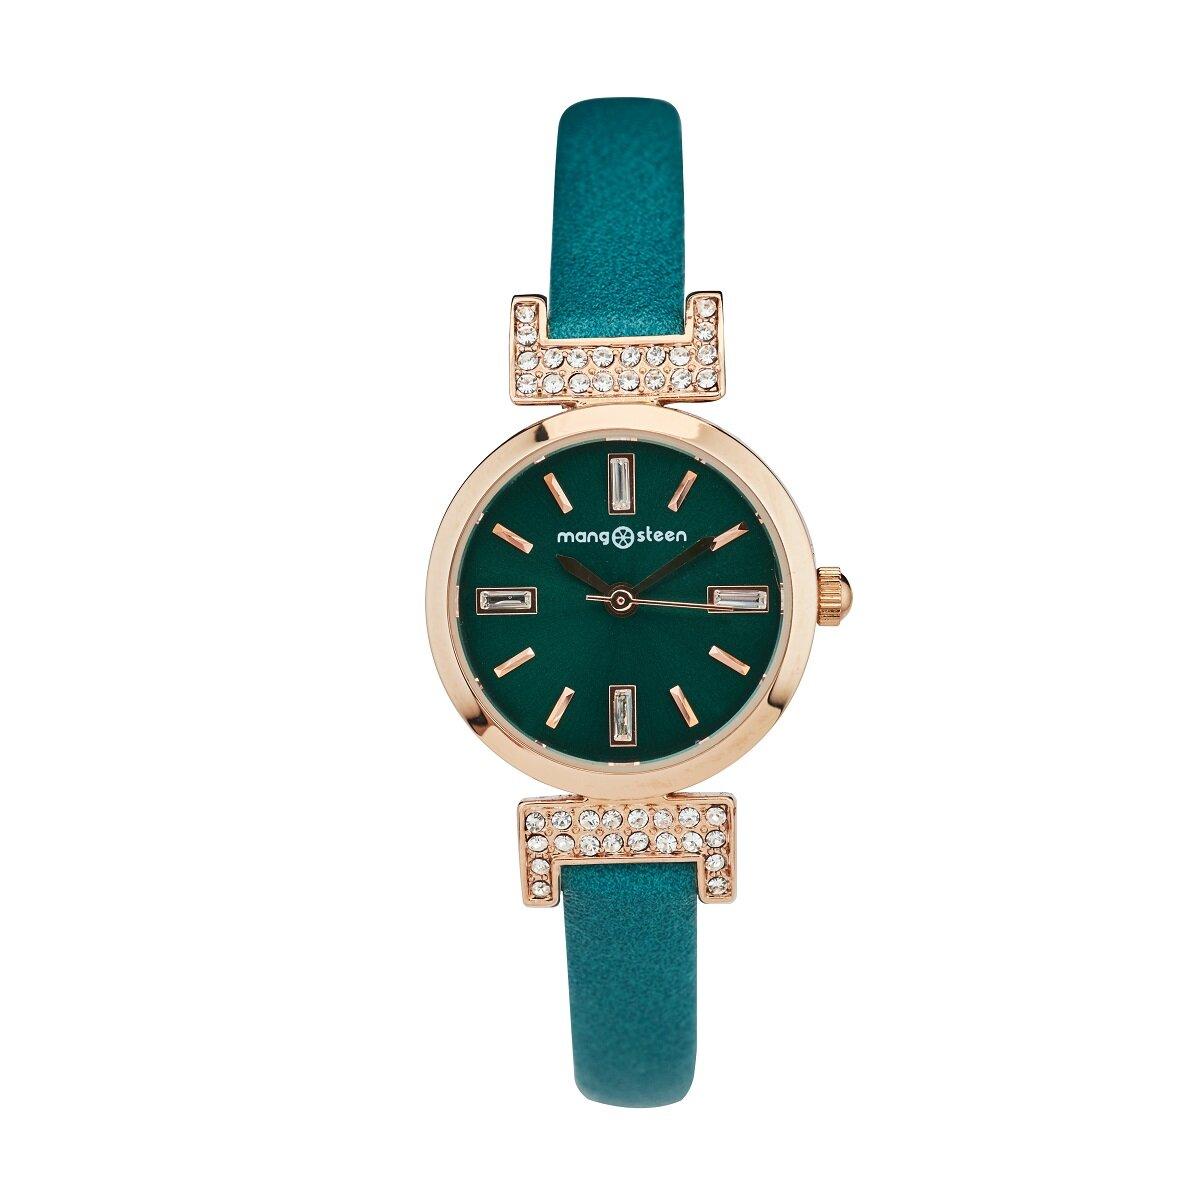 Đồng hồ nữ Mangosteen MS514B